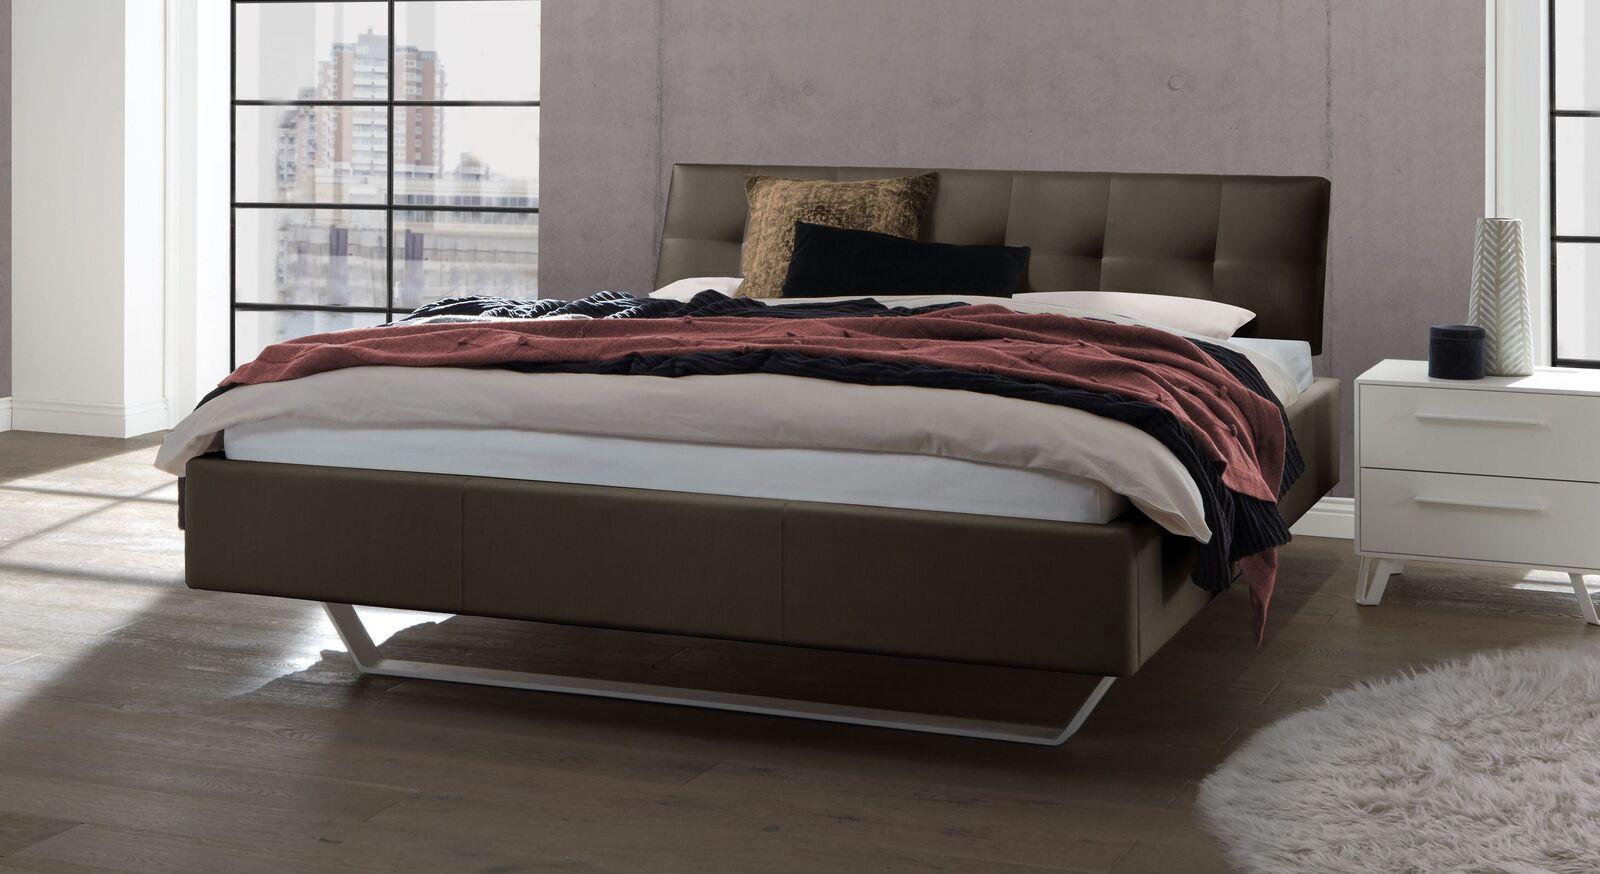 Bett Liene aus Echtleder in Khaki